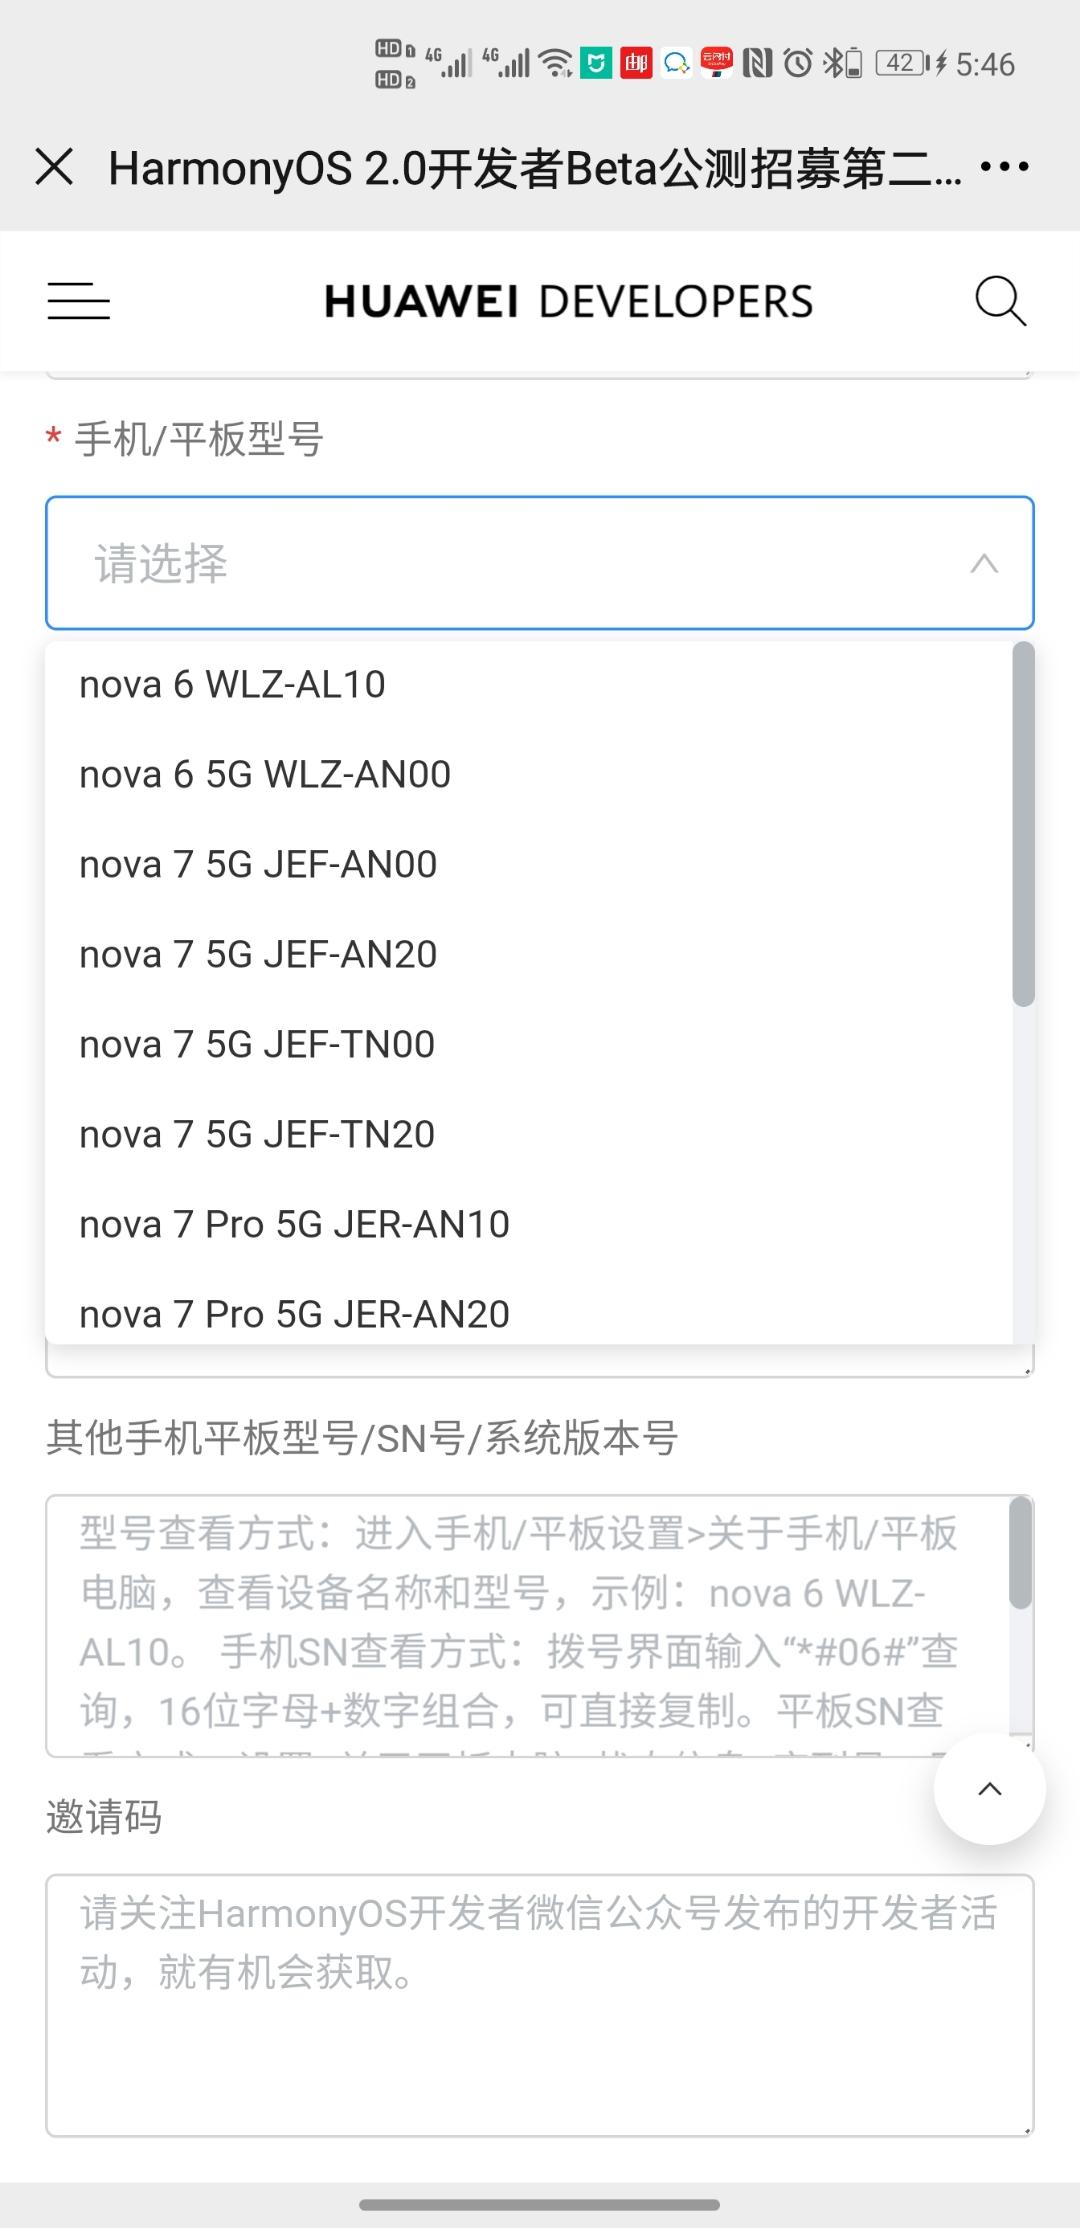 Screenshot_20210510_174625_com.tencent.mm.jpg